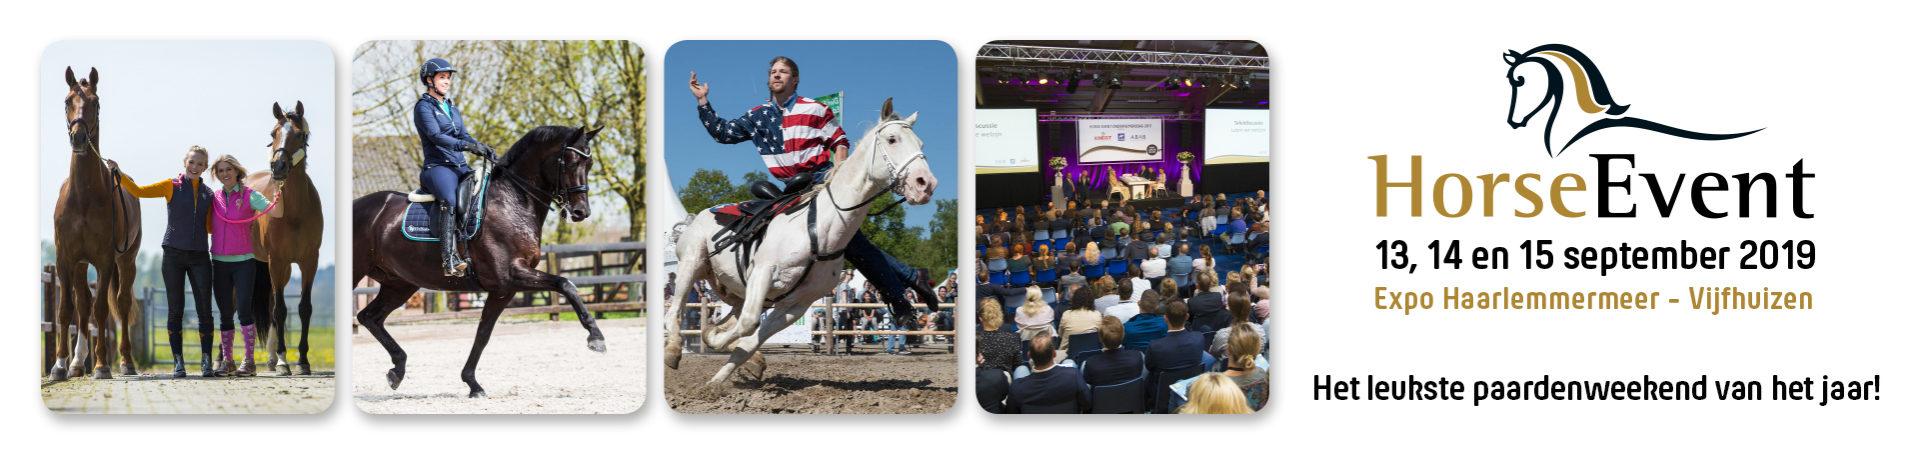 Horse Event 2019 1920x450